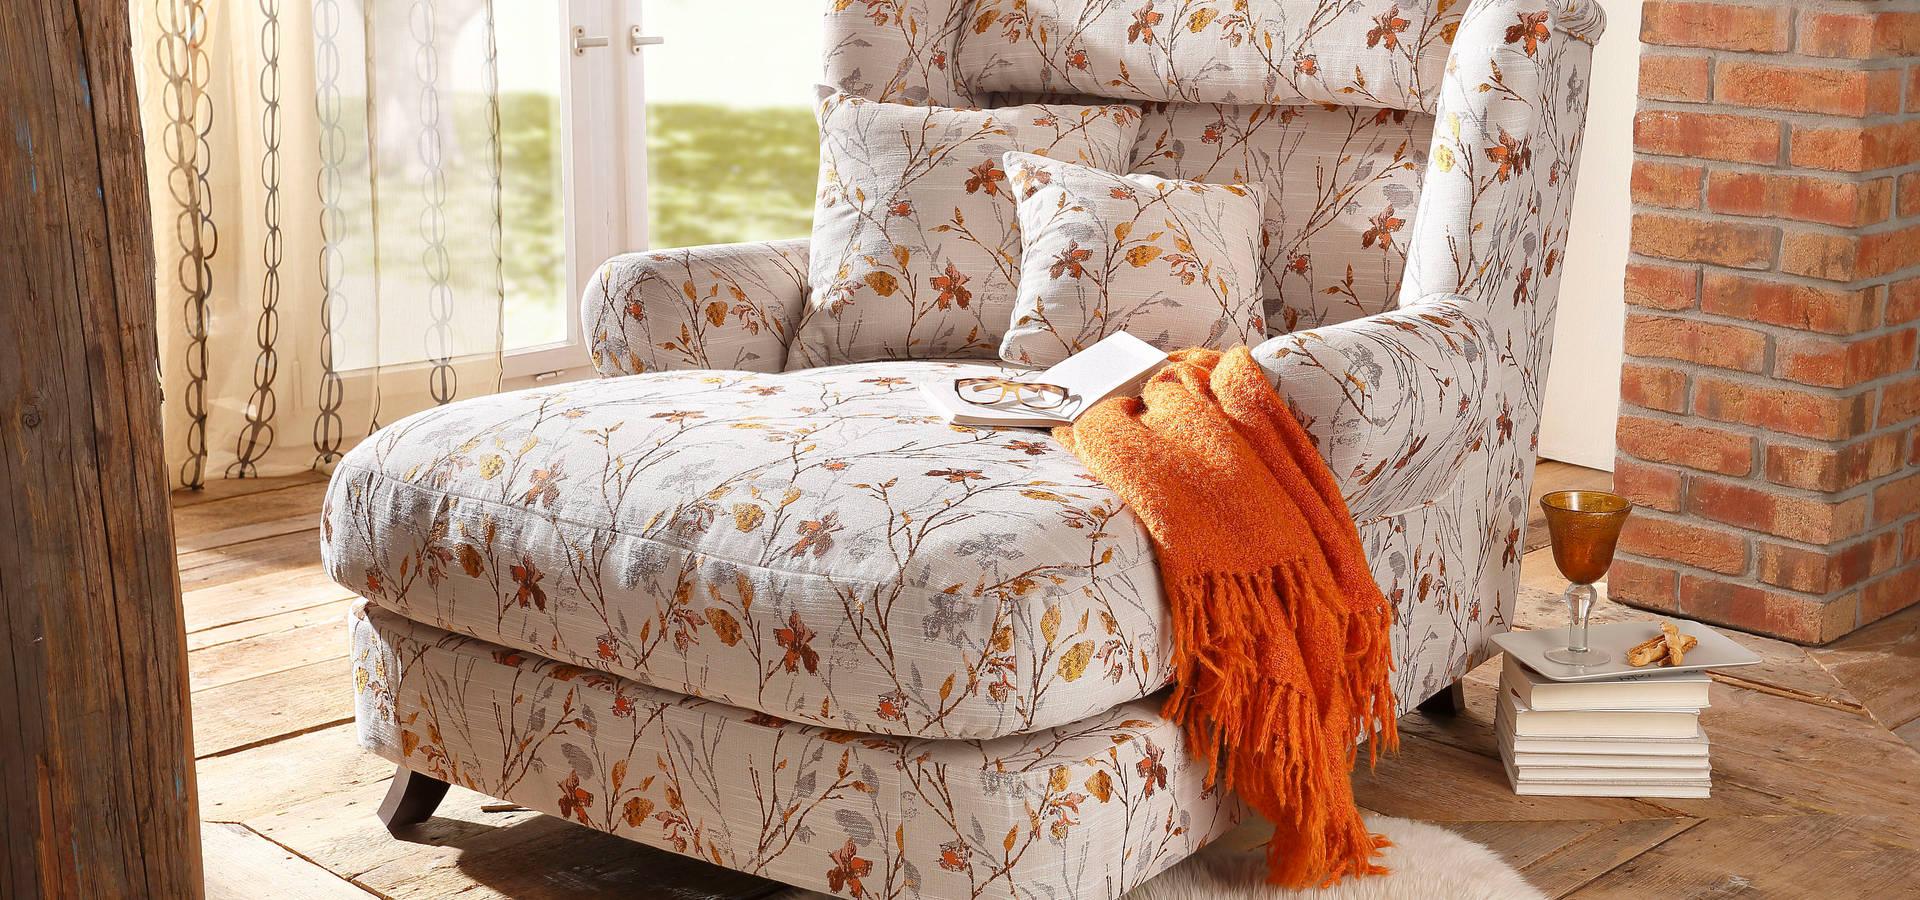 m bel im landhausstil von baur versand gmbh co kg homify. Black Bedroom Furniture Sets. Home Design Ideas